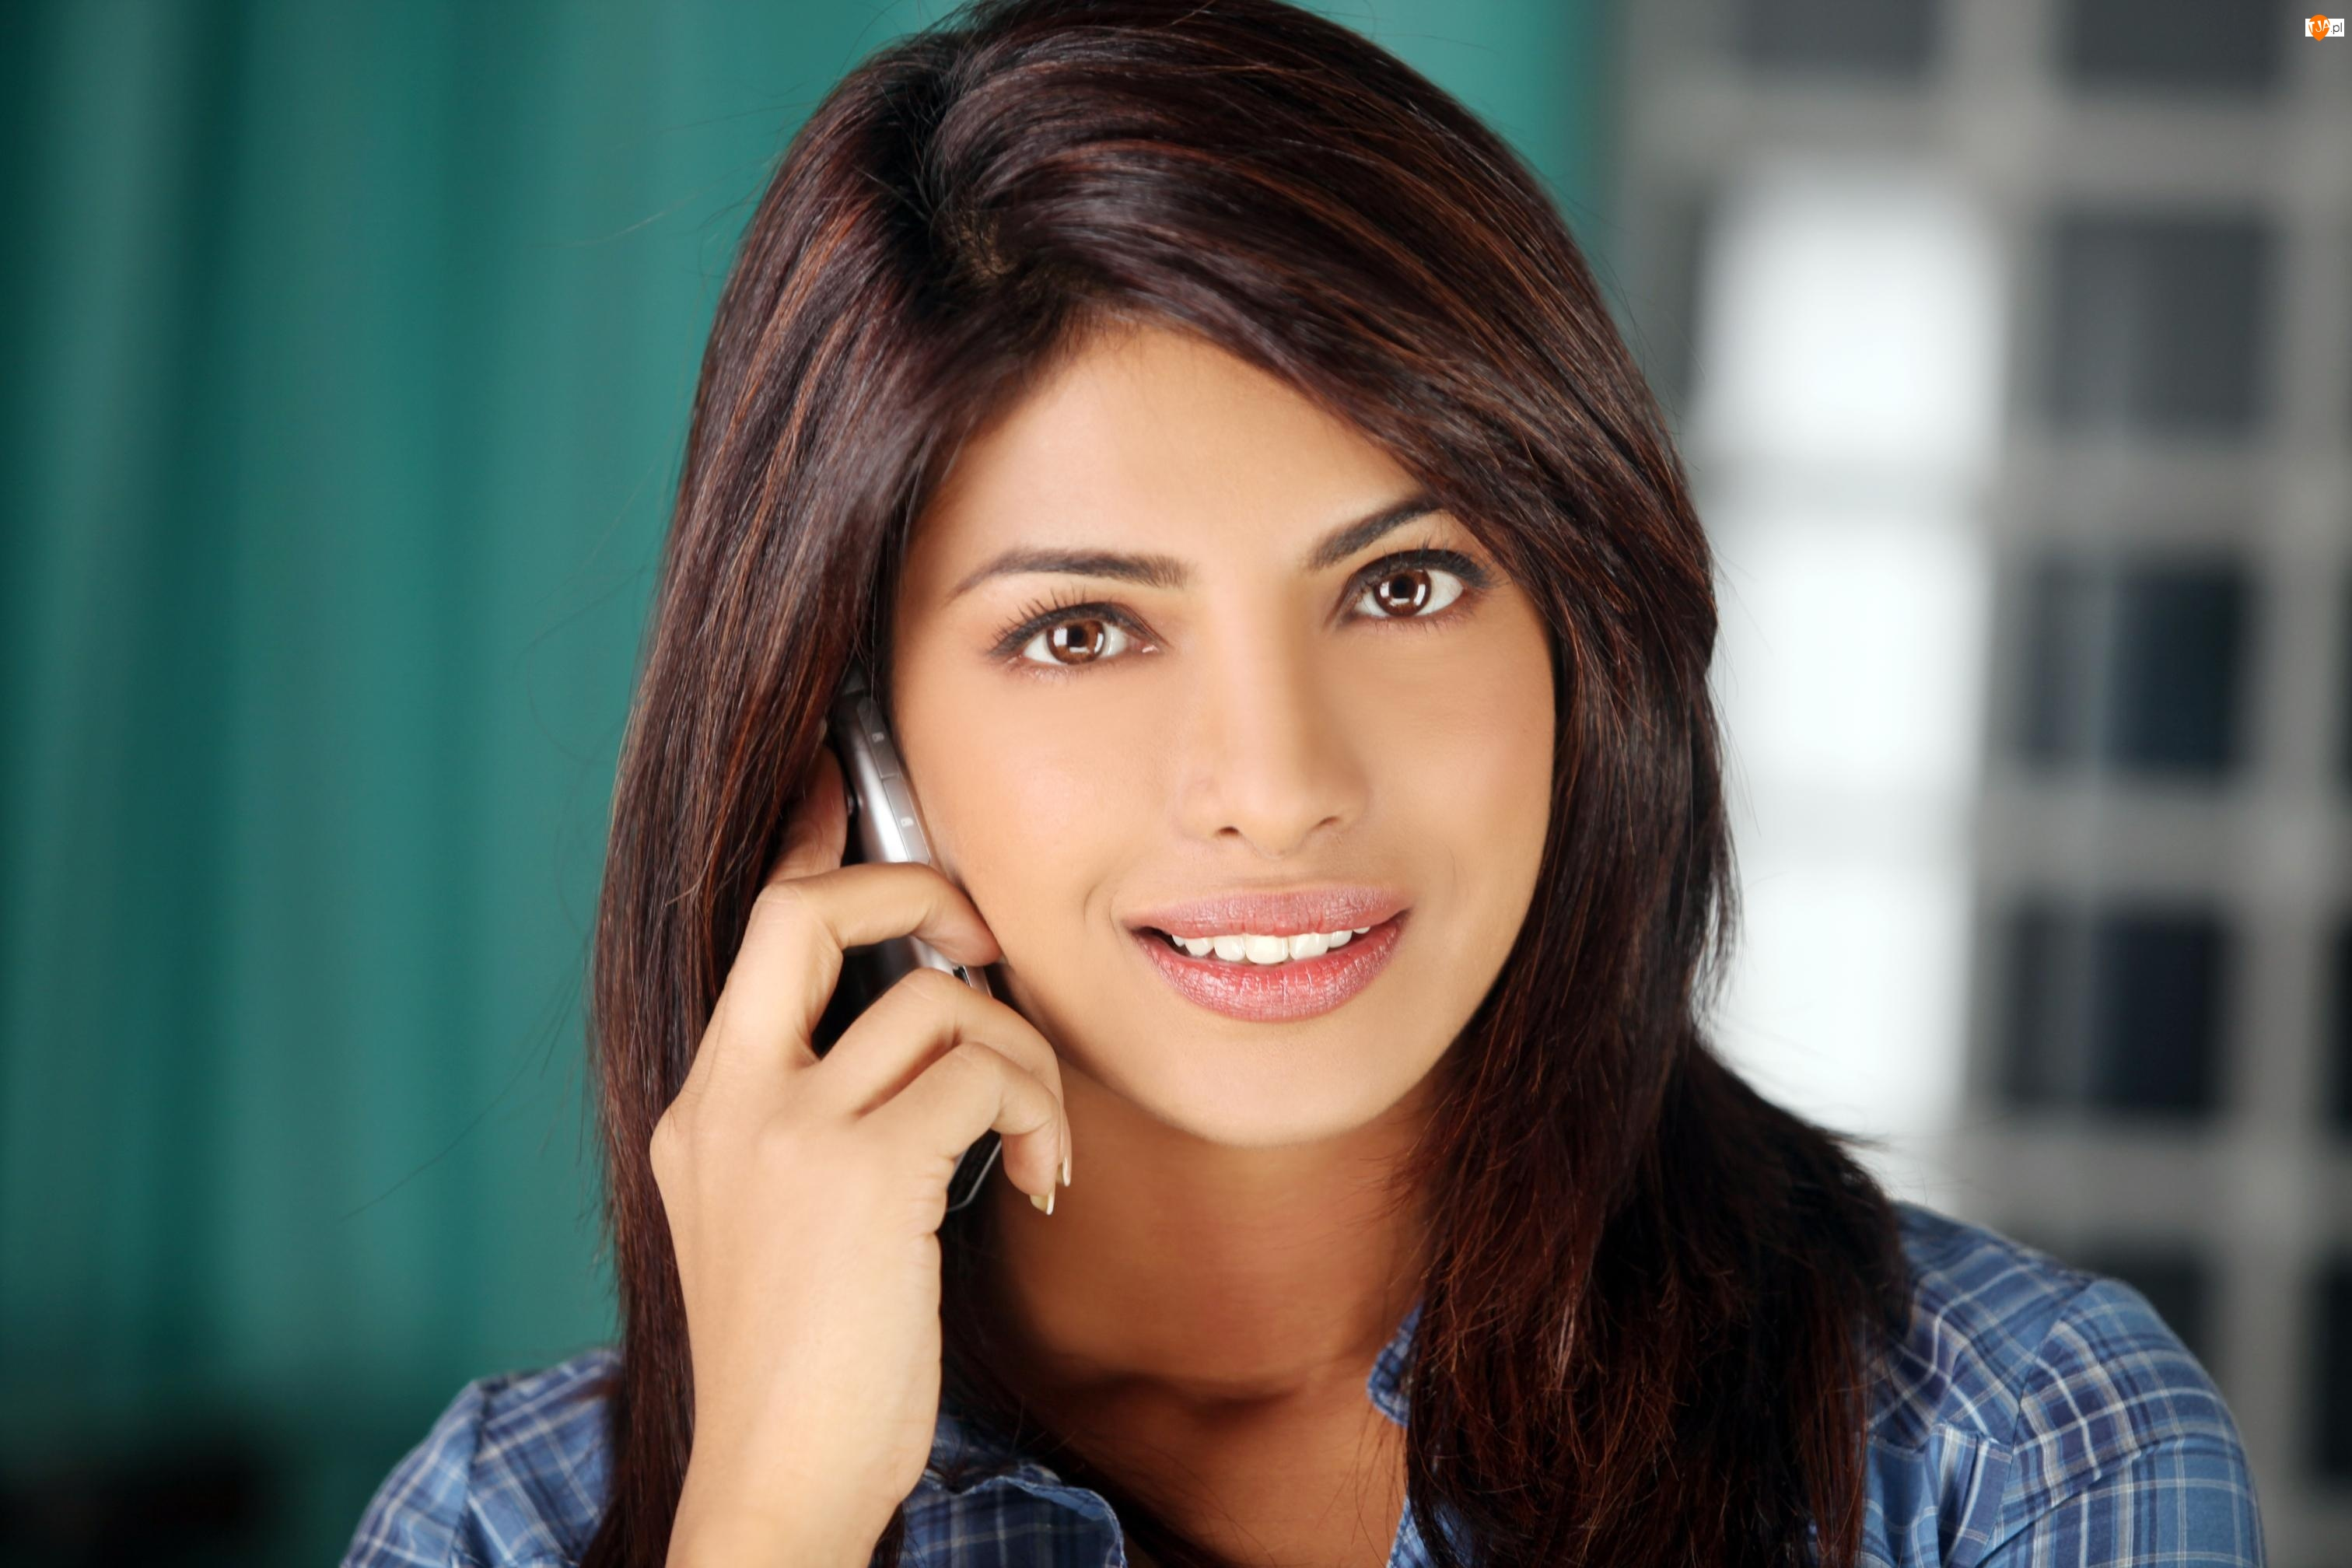 Kobieta, Bollywood, Priyanka Chopra, Hinduska